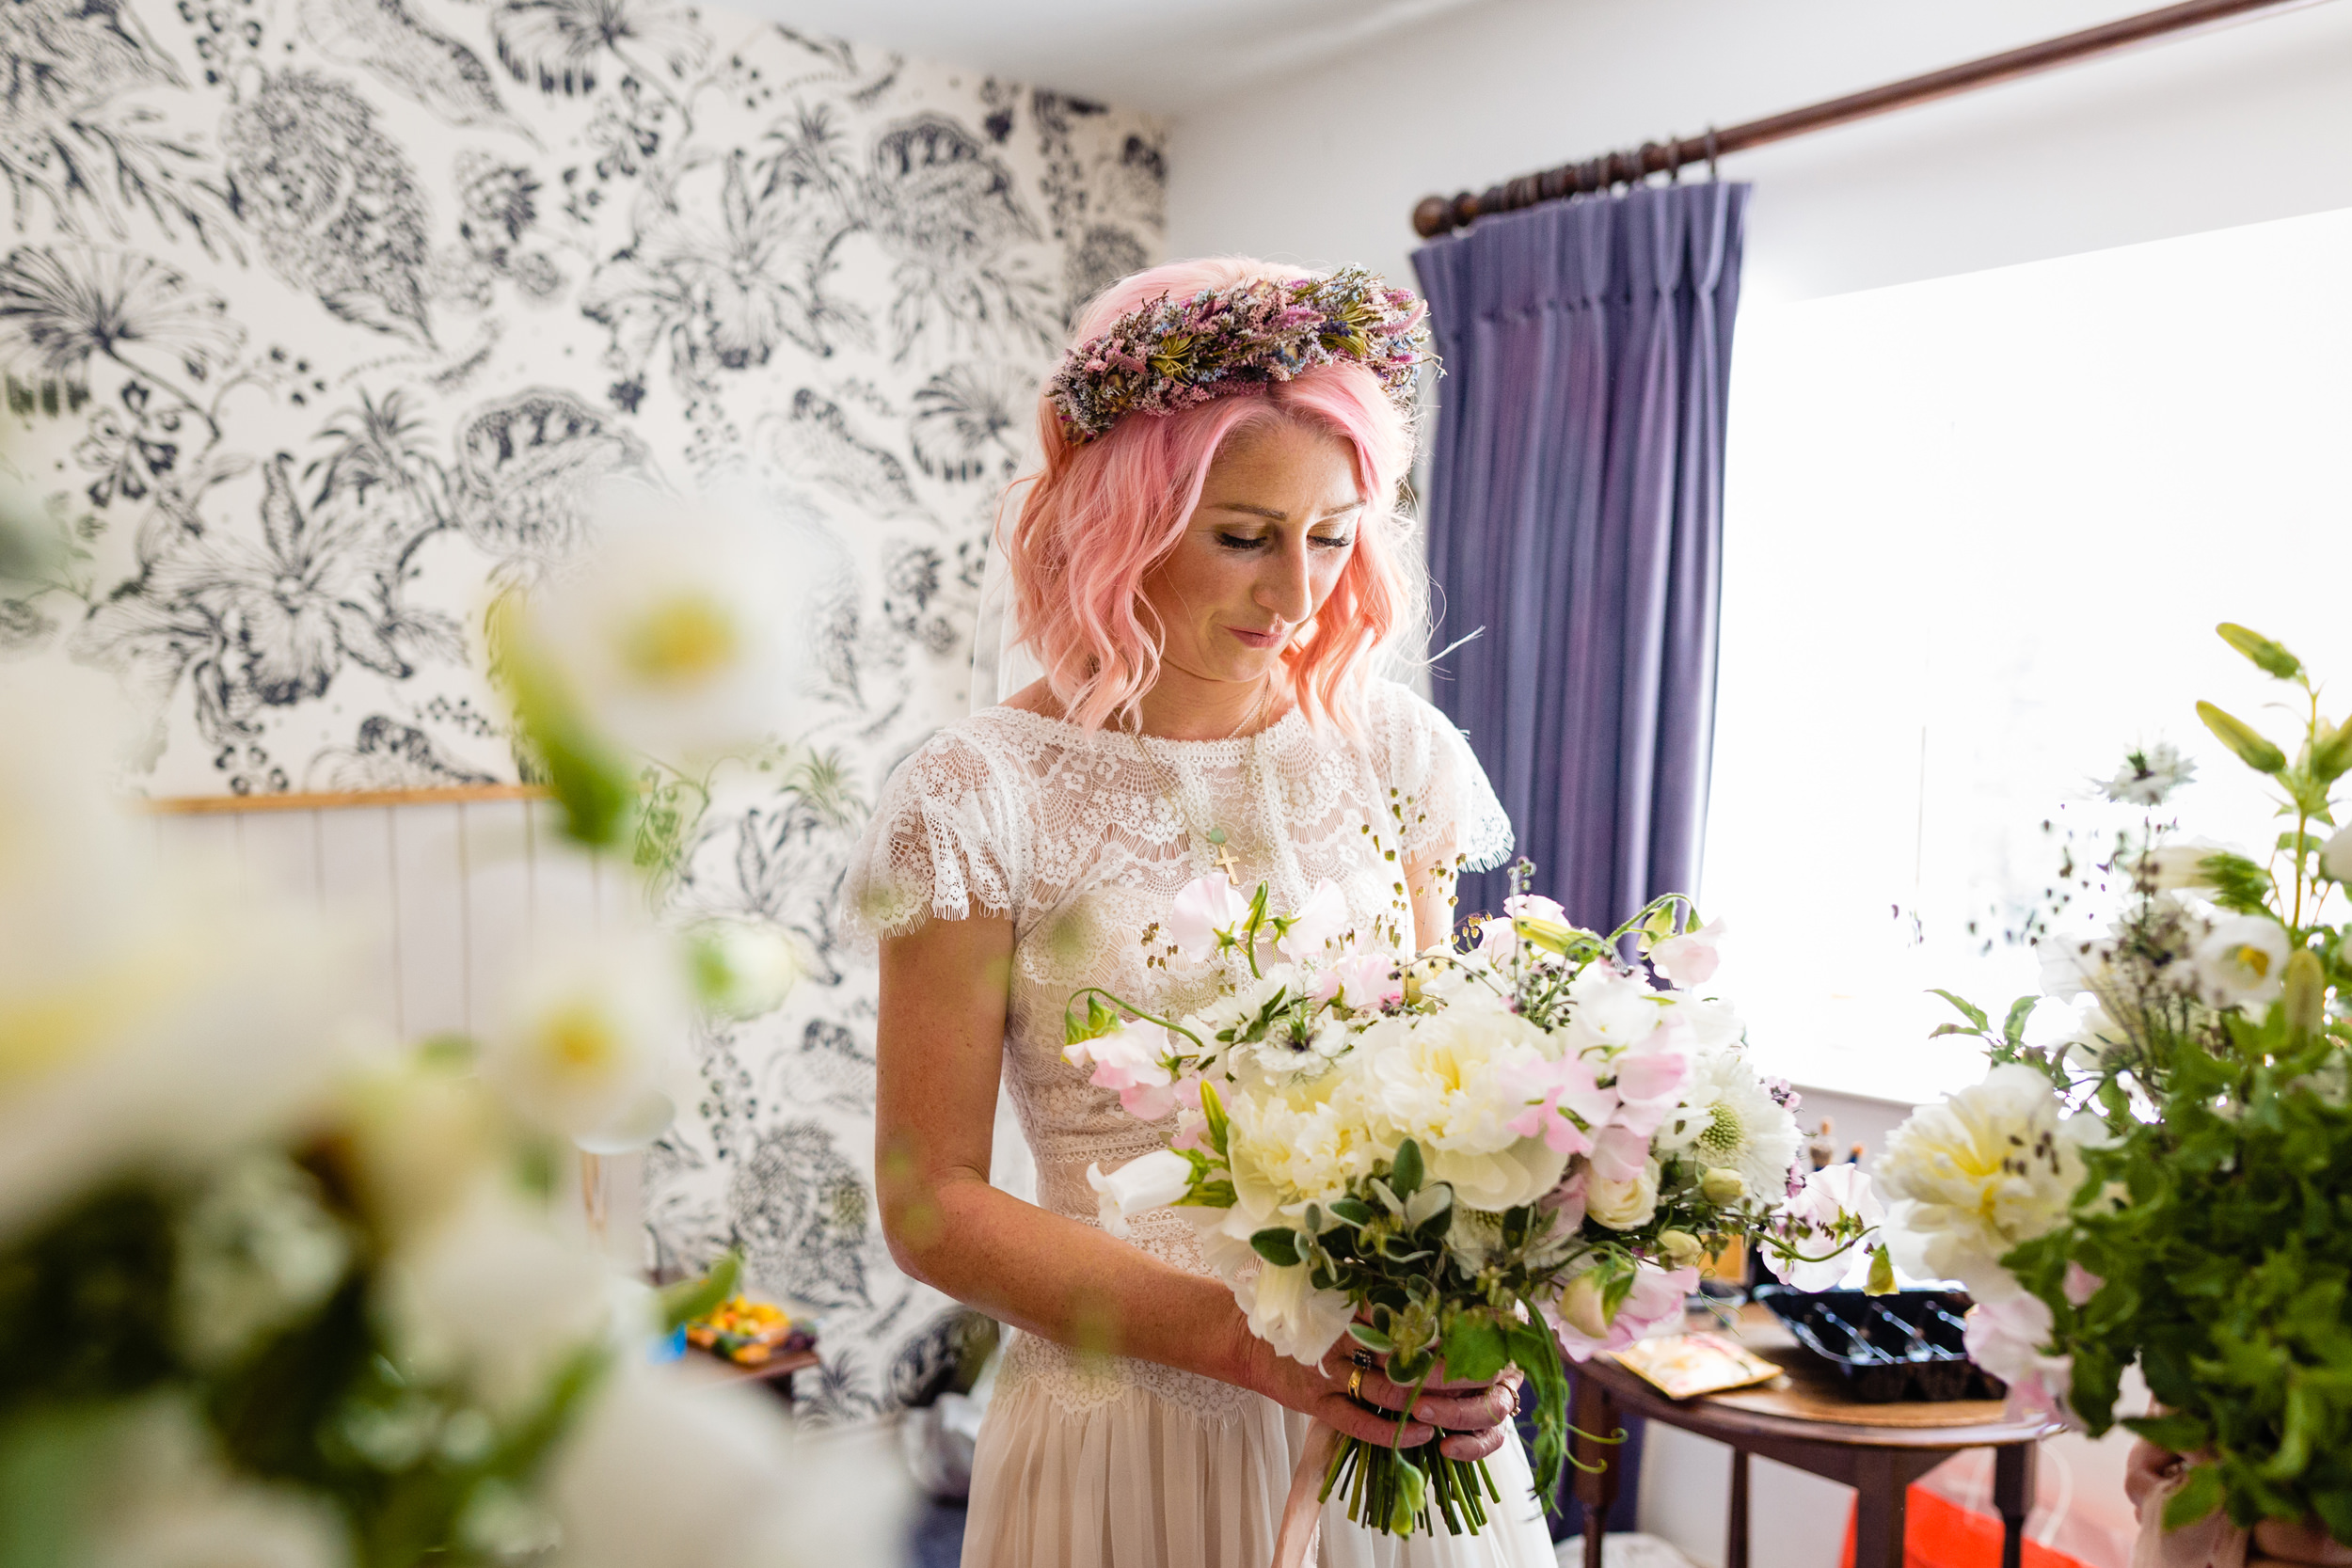 bride admiring her bouquet. maybush wedding co wedding photography by emma and rich.